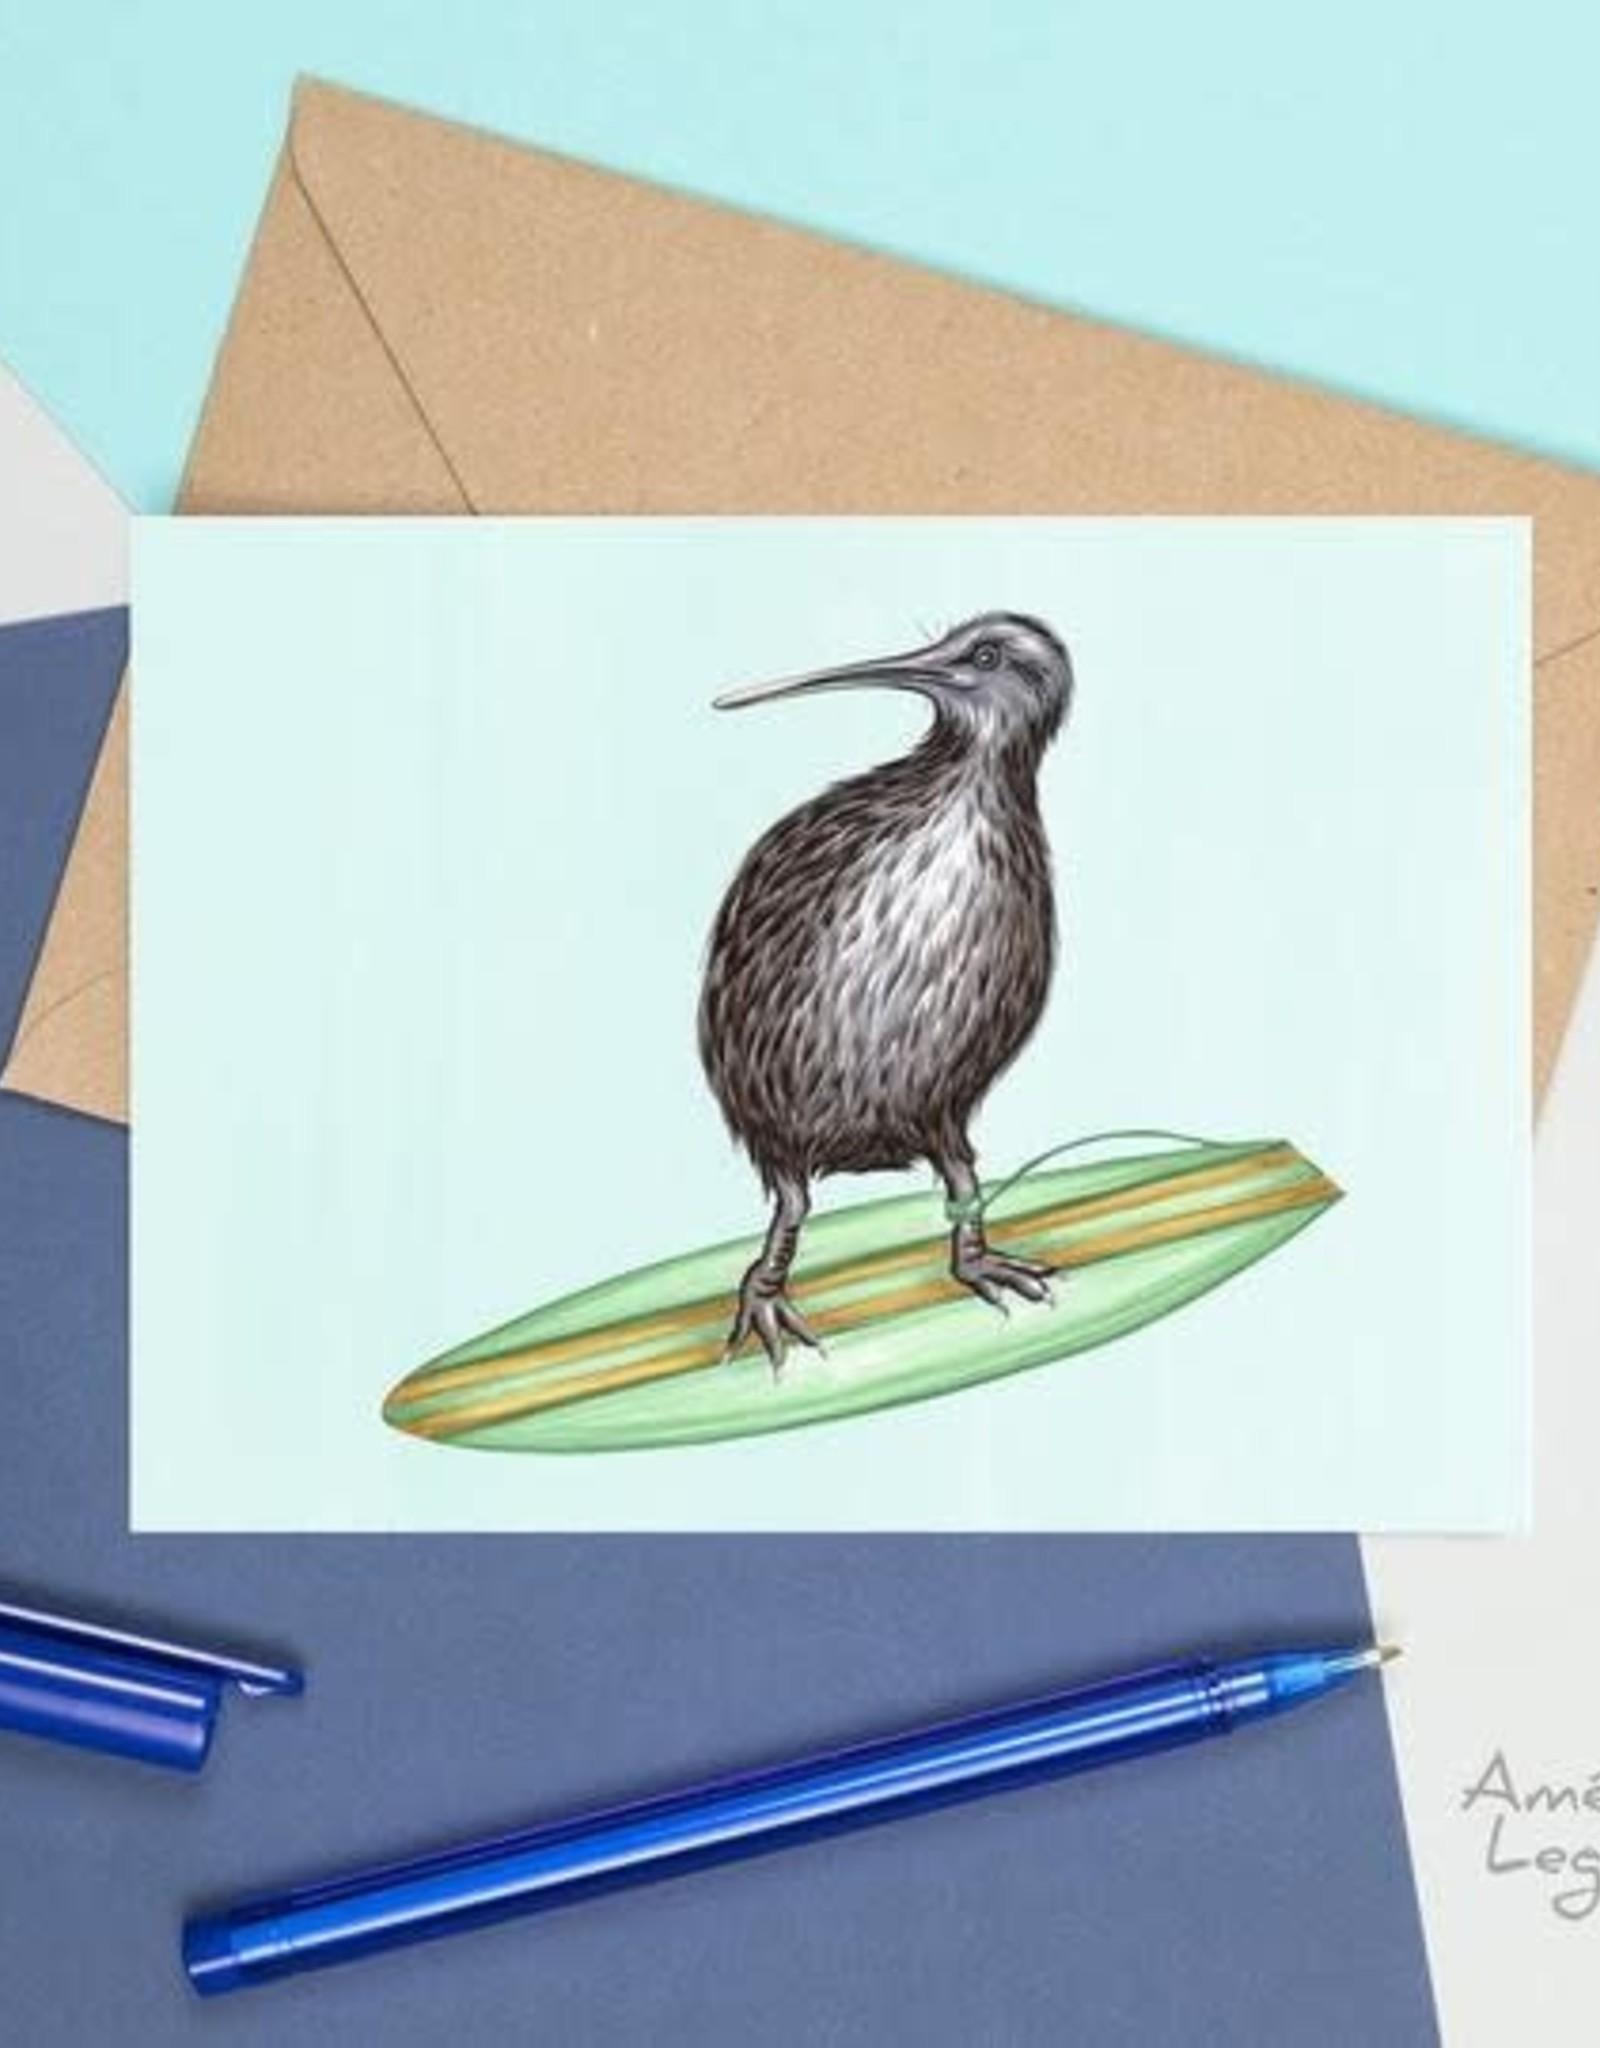 Amelie Legault Carte Amelie Legault Kiwi qui surf